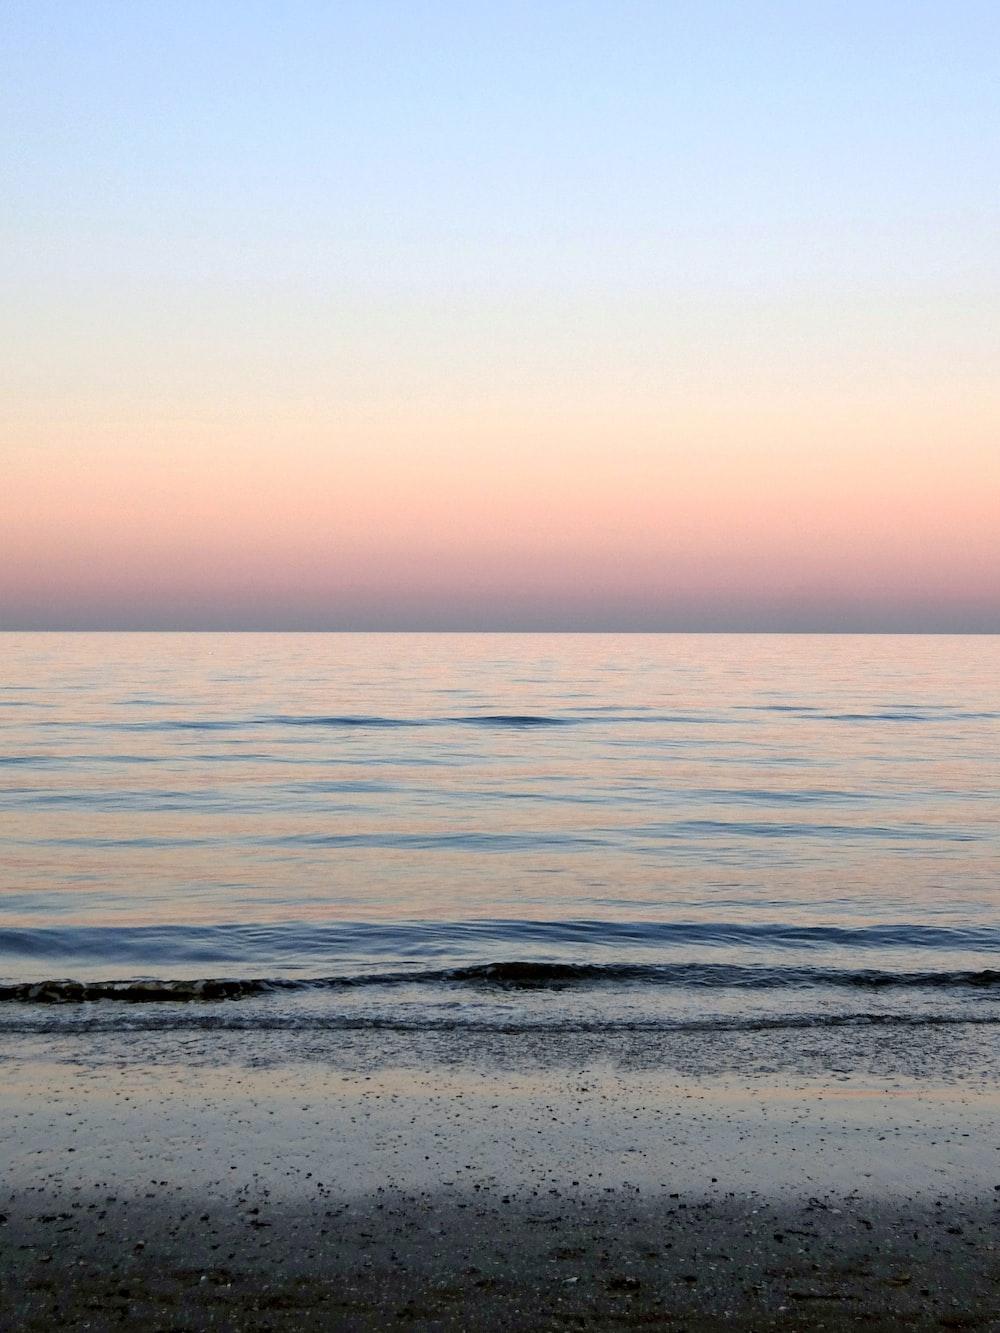 ocean water under blue sky during daytime